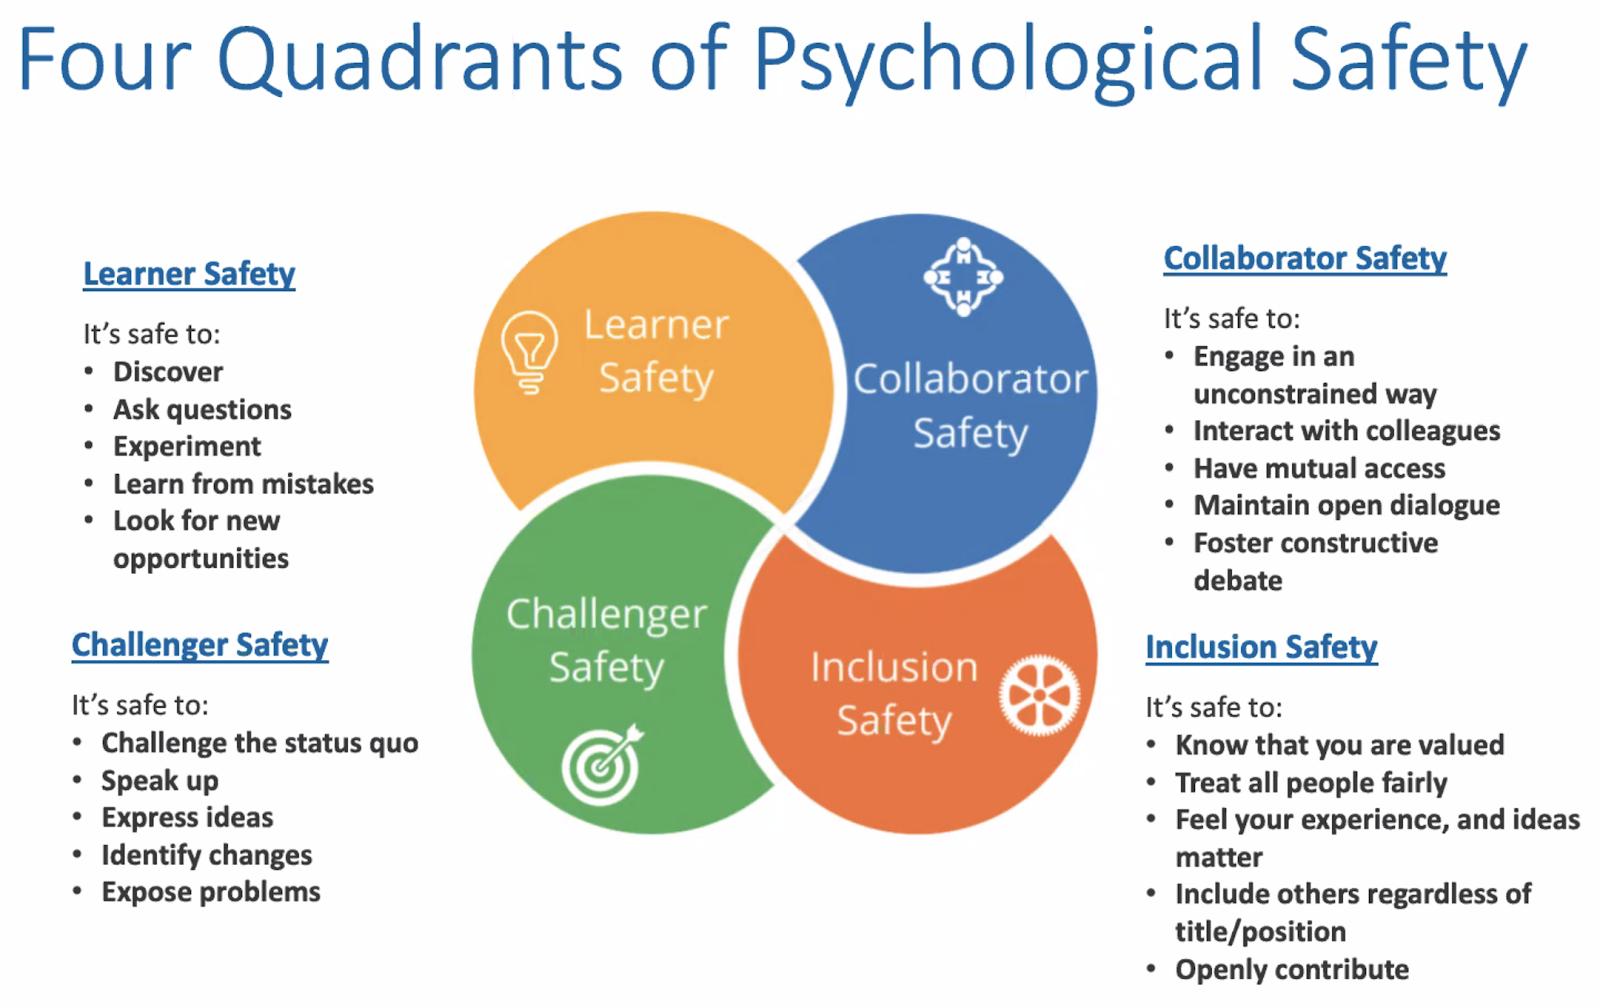 4 levels of psychological safety